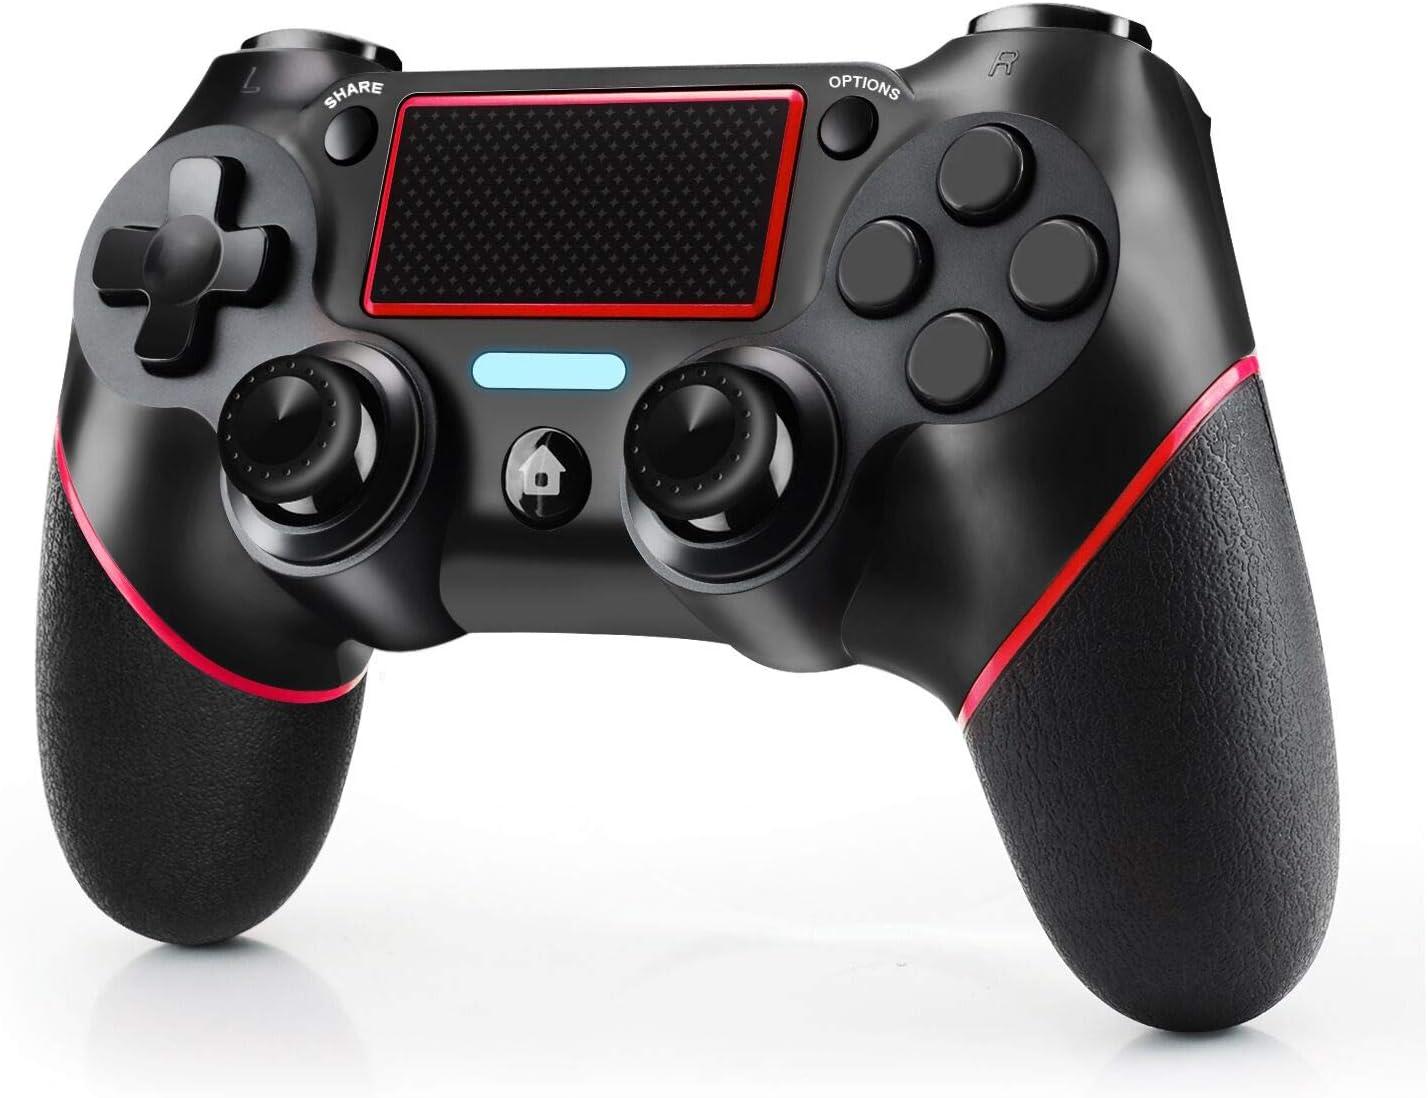 JAMSWALL Mando Inalámbrico para PS4, Mando para PS4/Pro/Slim/ PC, Controlador inalámbrico, Gamepad Wireless Bluetooth Controlador Joystick con Vibración Doble/Turbo/ Puerto de Audio/ Pantalla LED